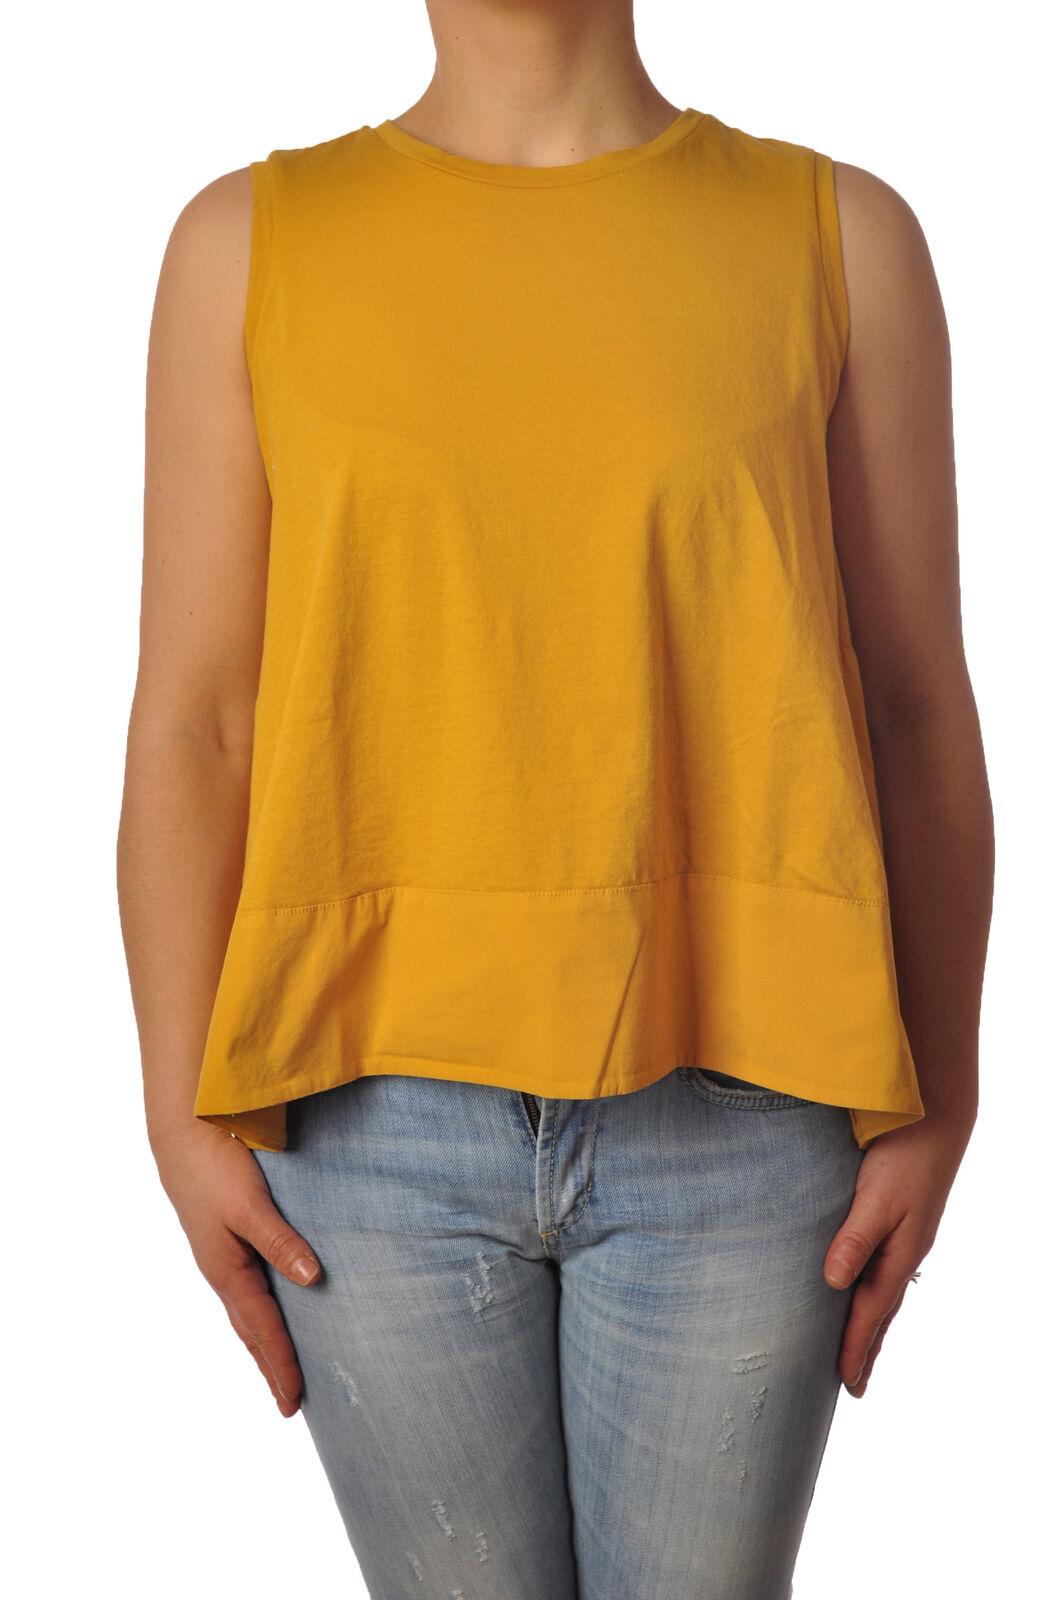 Ottod'ame - Topwear-Sleeveless Top - Woman - Gelb - 4942526E183919